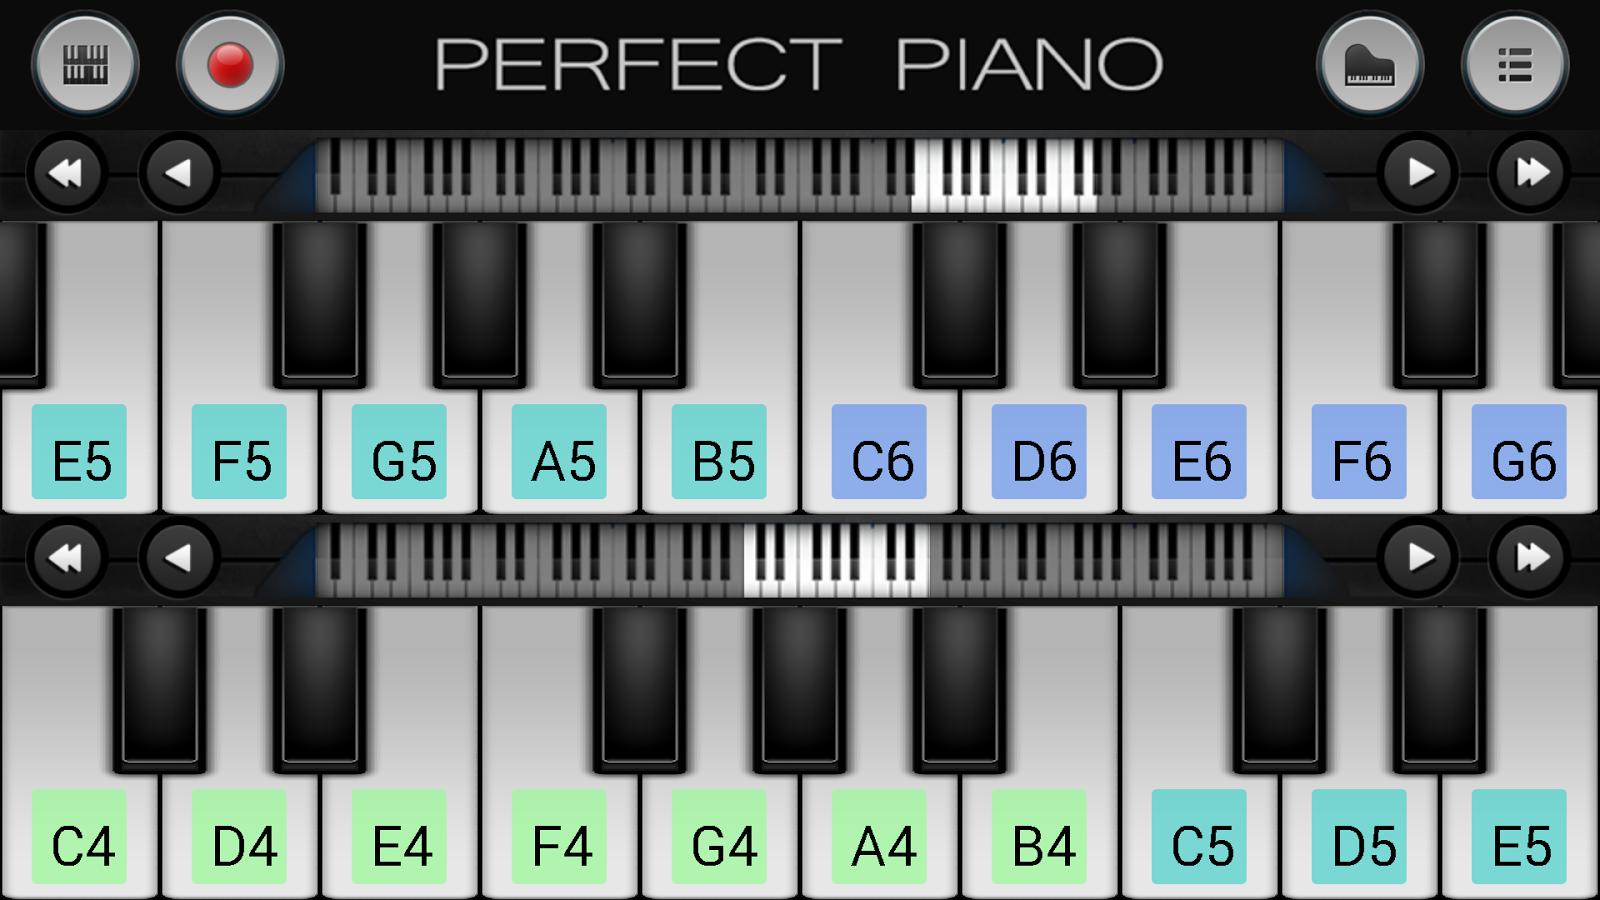 Piyano Oyunu Android